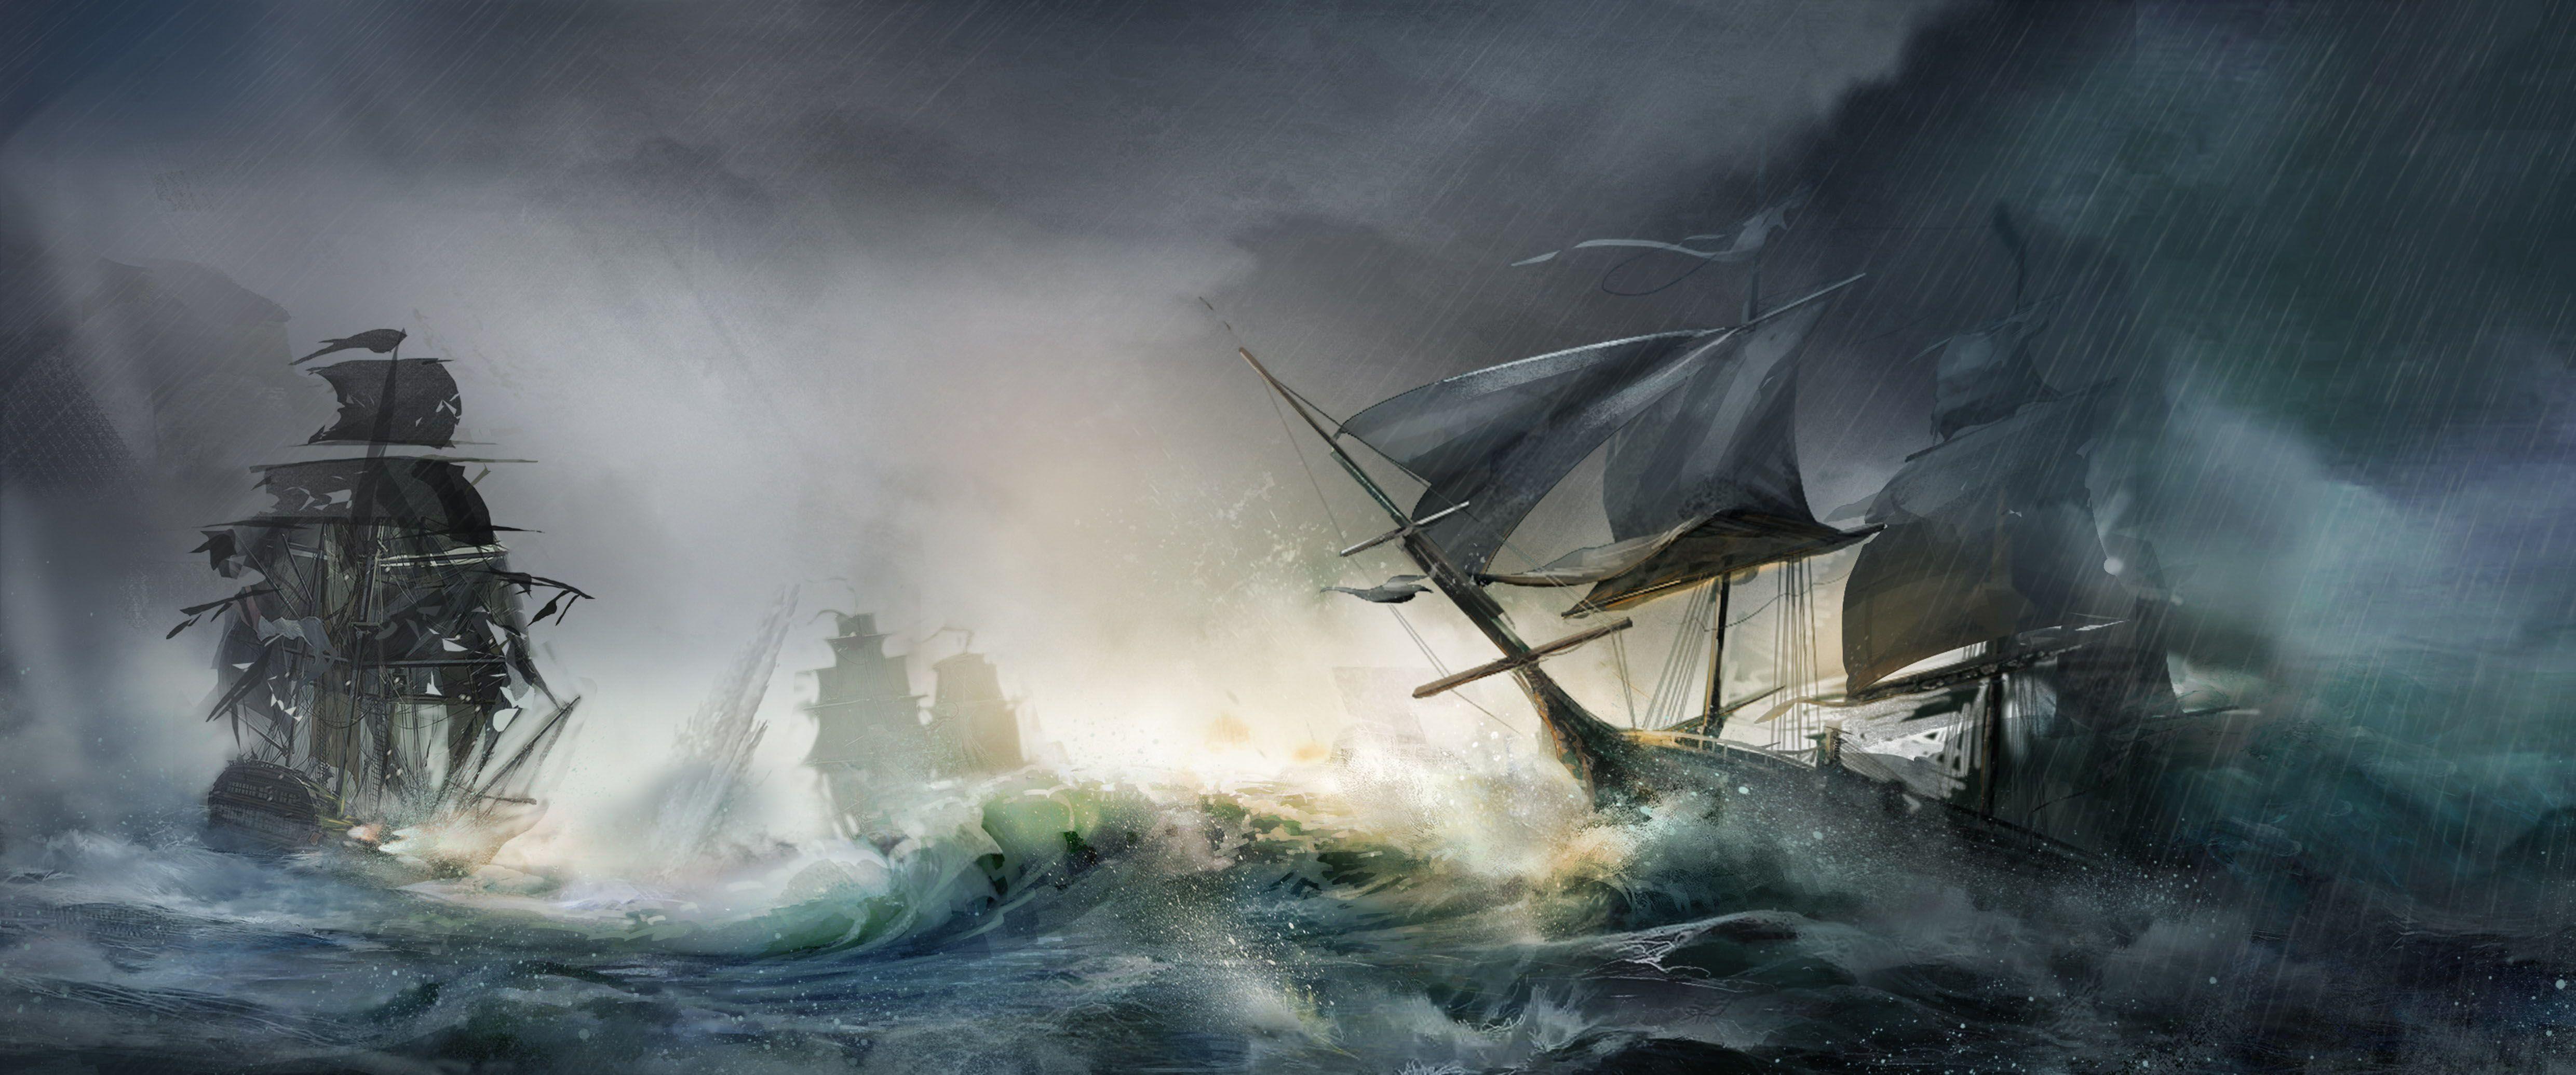 Pin By Duffy Laudick On Old Sailing Ships Ship Artwork Nature